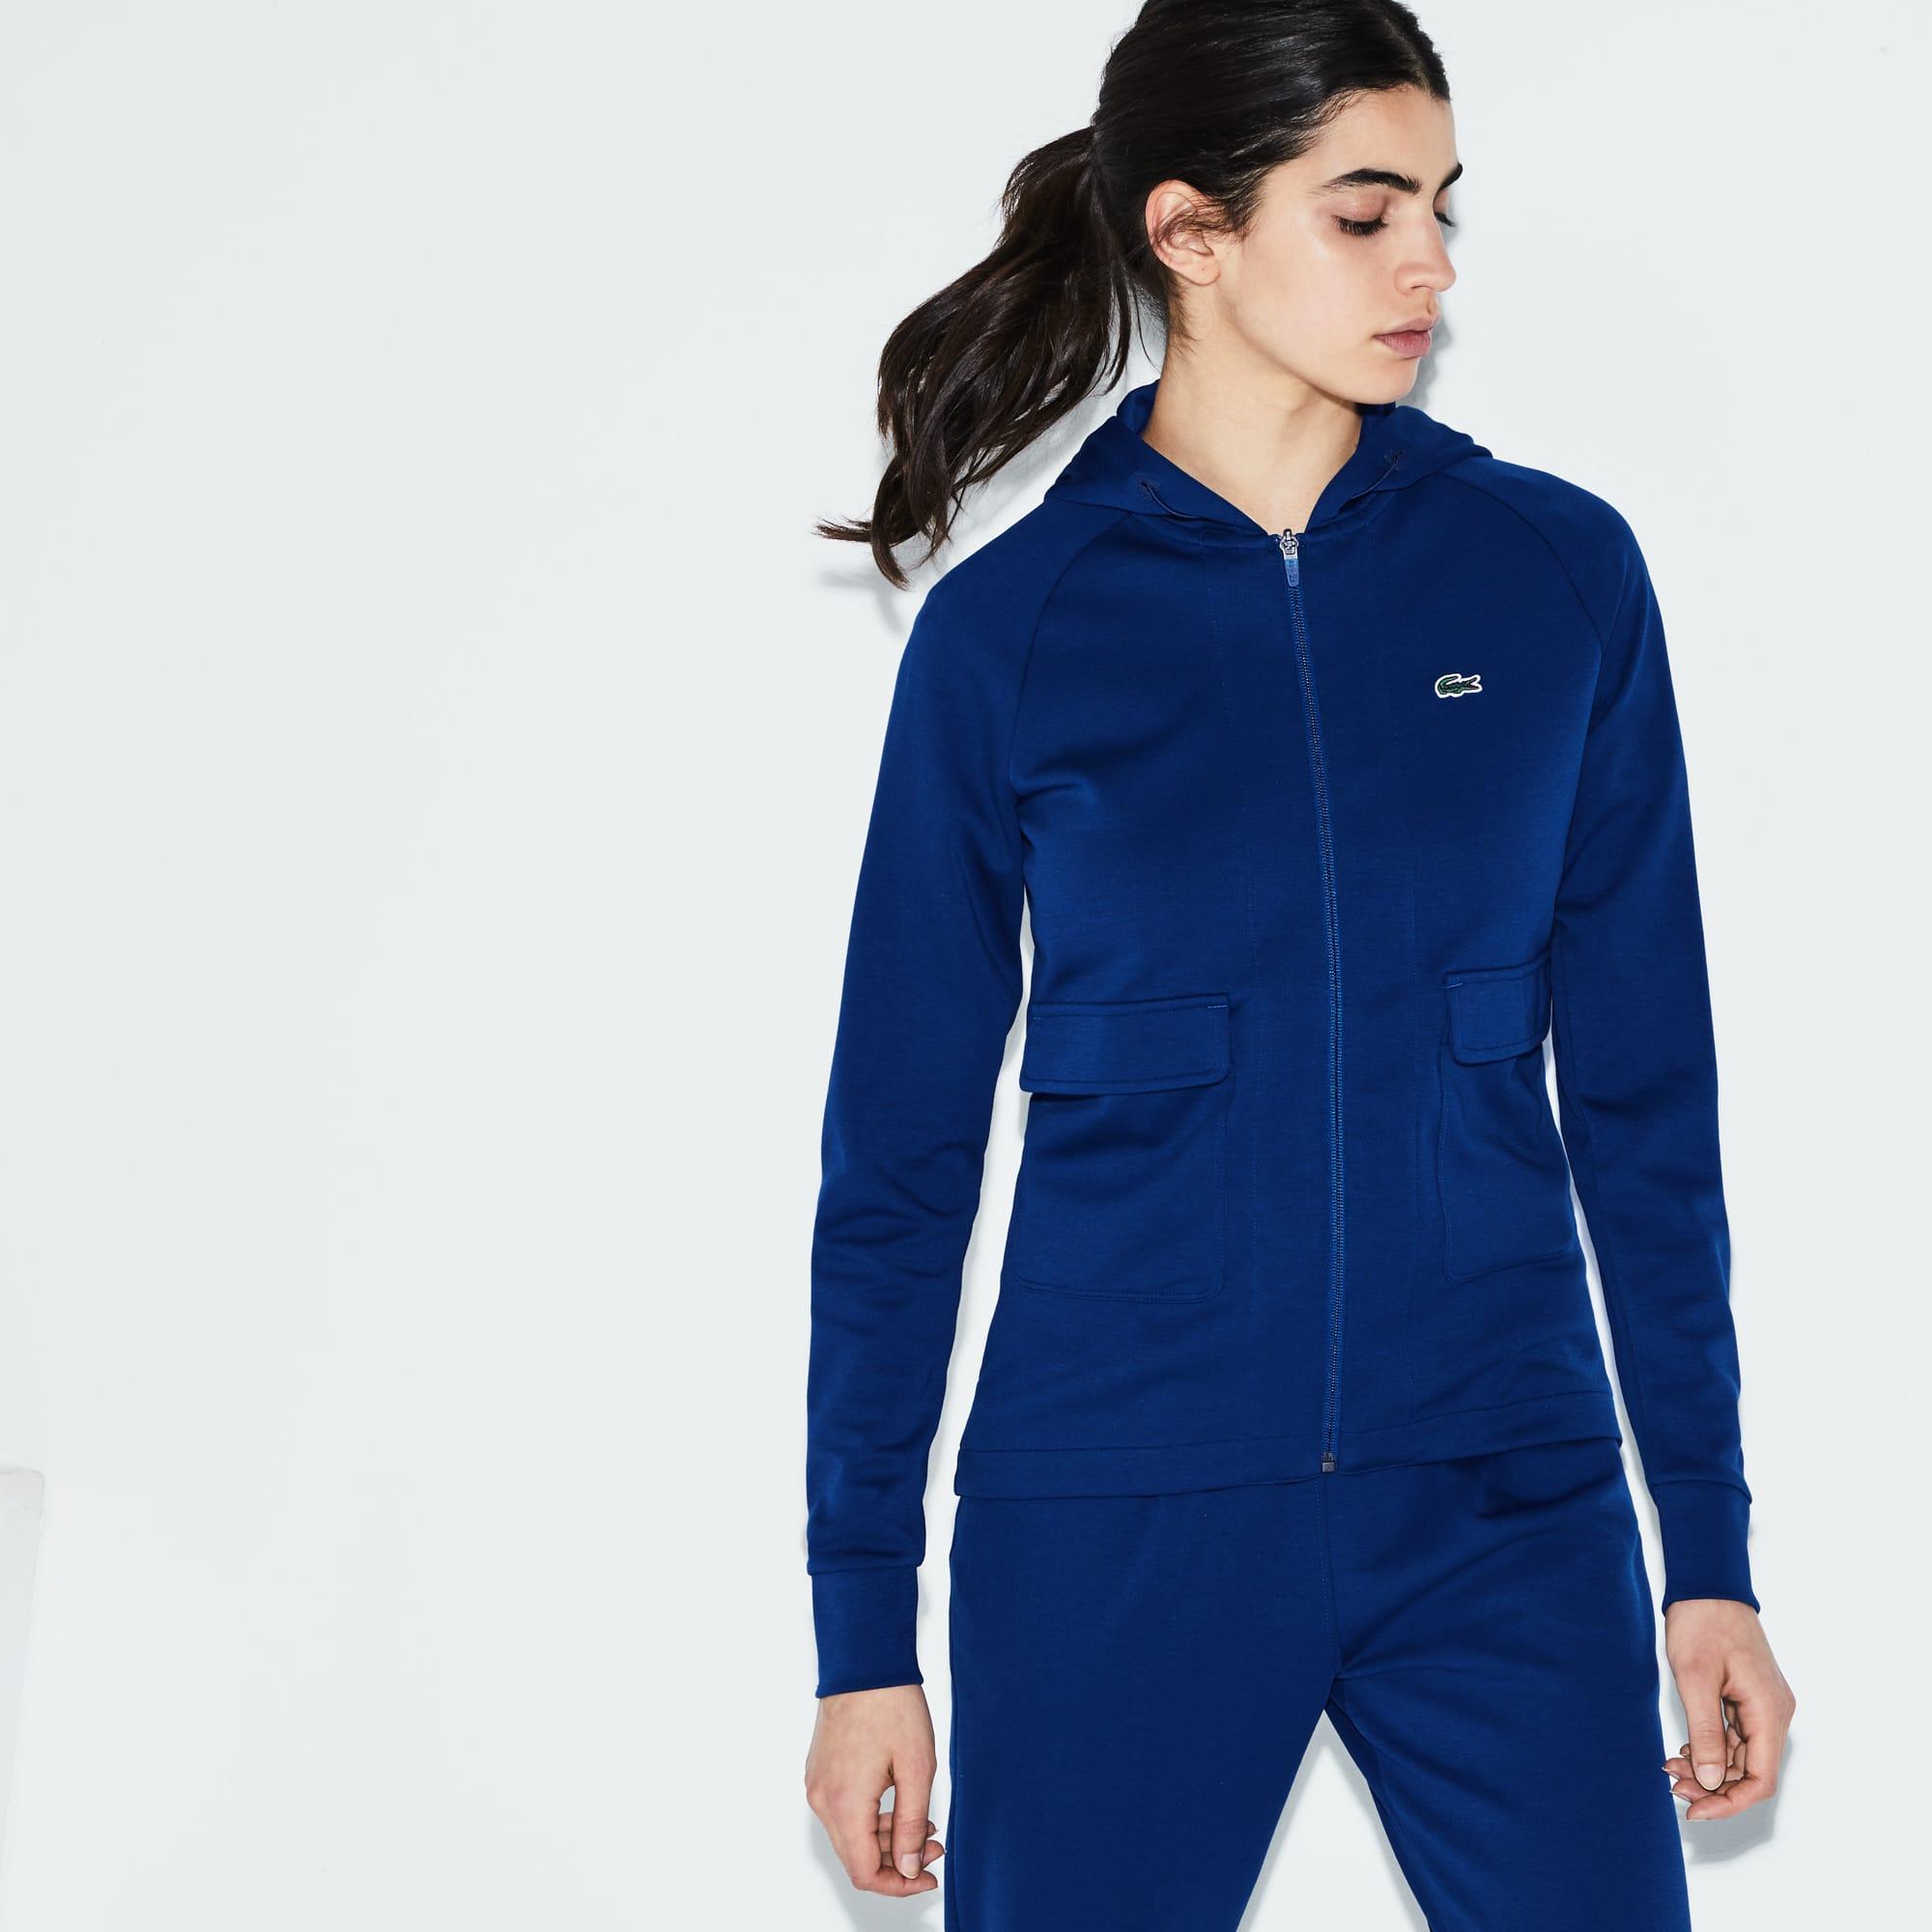 Women's Lacoste SPORT Hooded Zip Cotton Tennis Sweatshirt